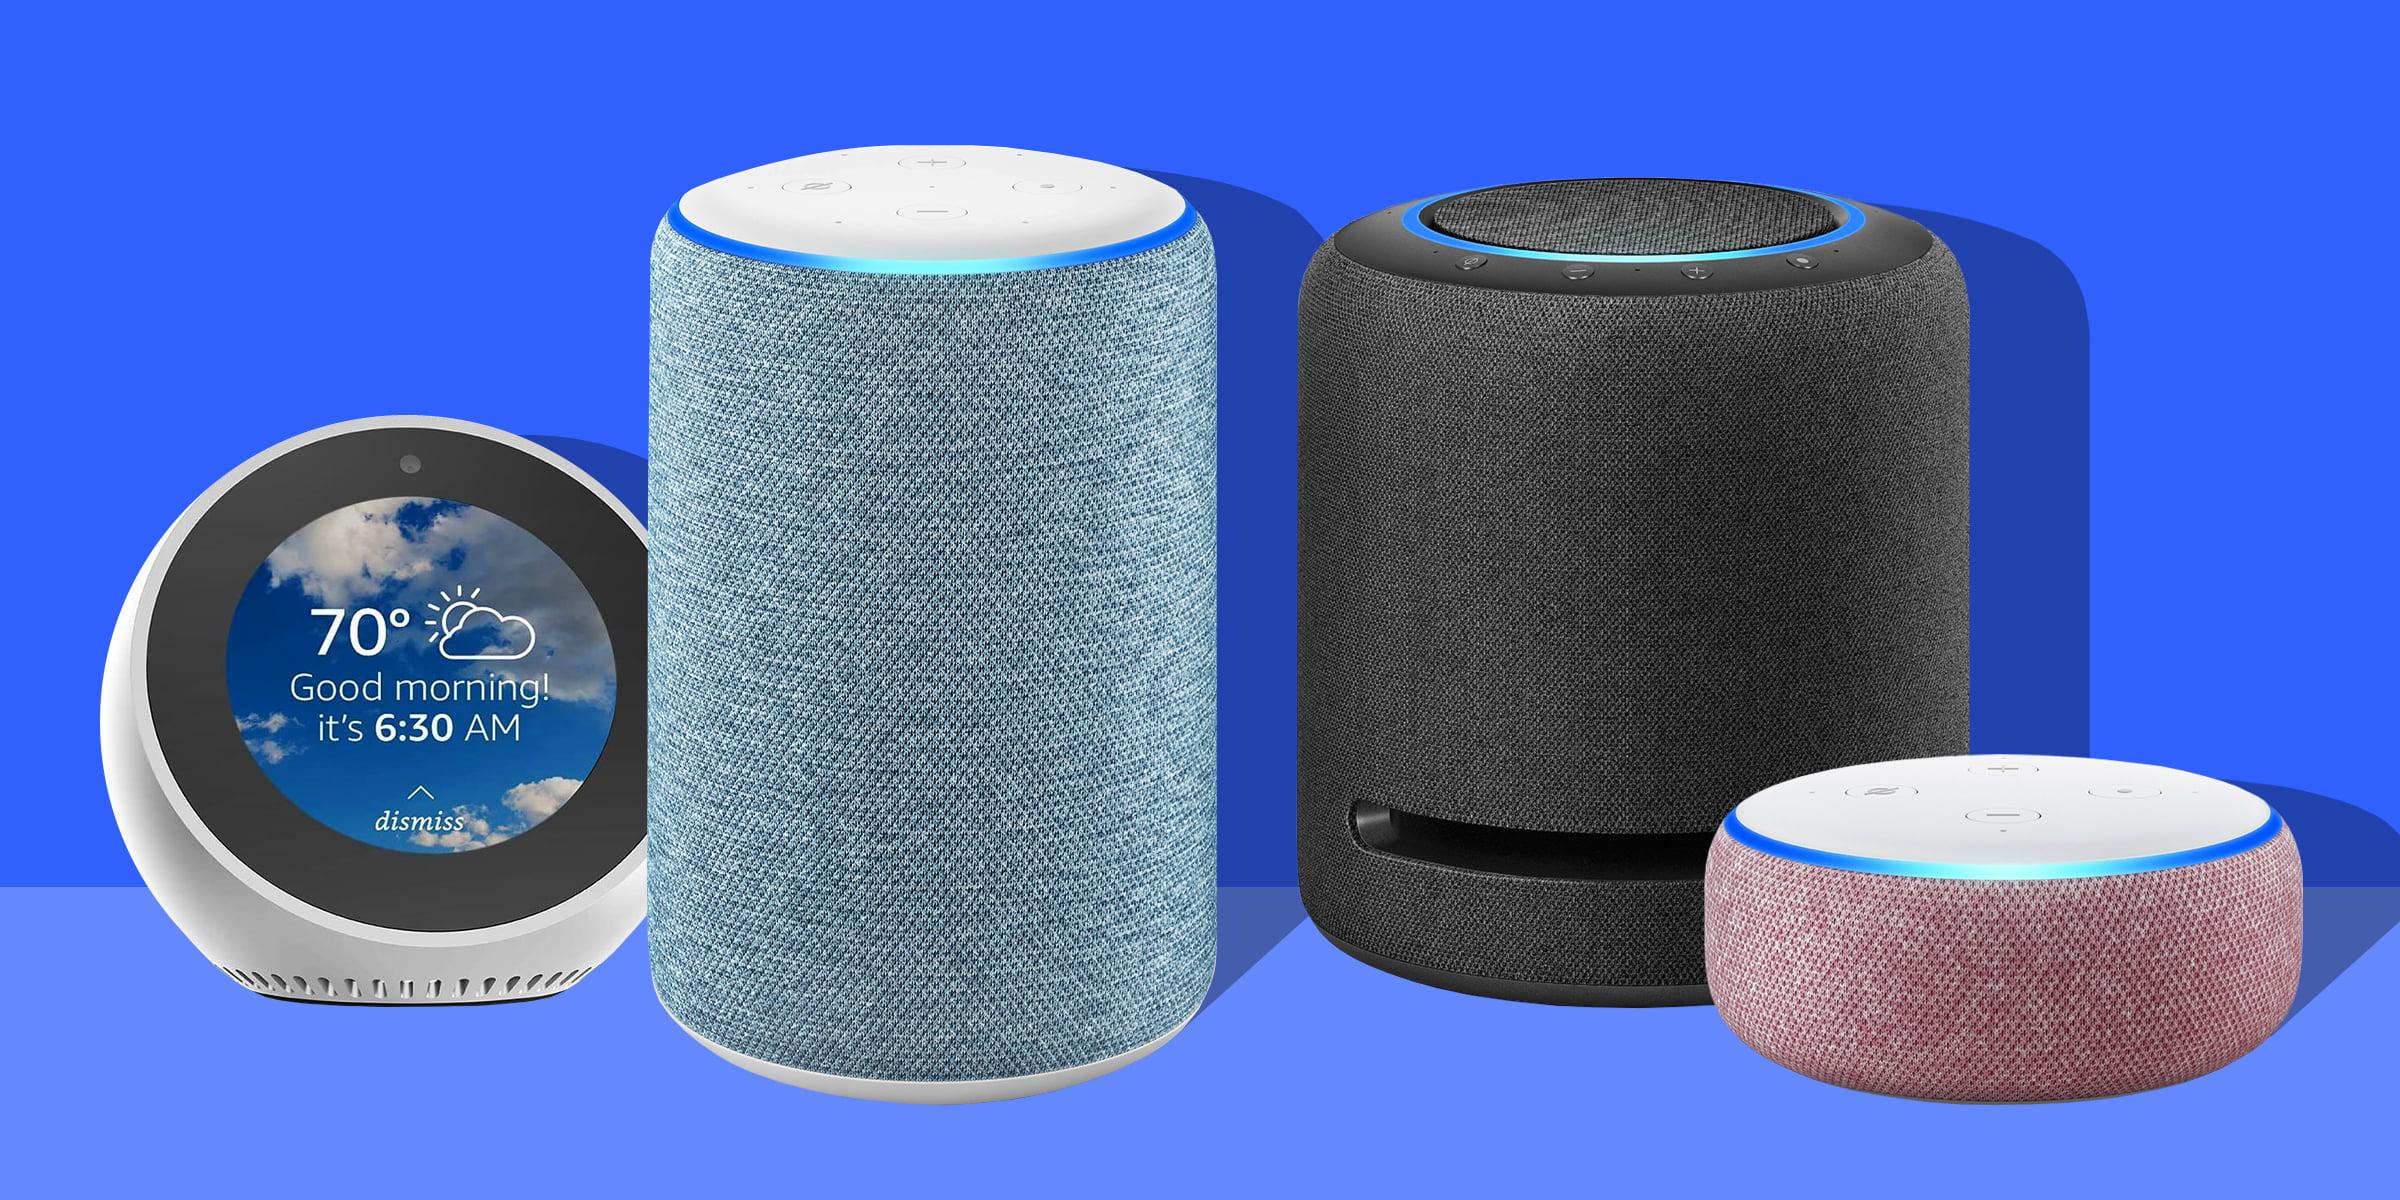 Amazon launches Live Translation mode for Alexa